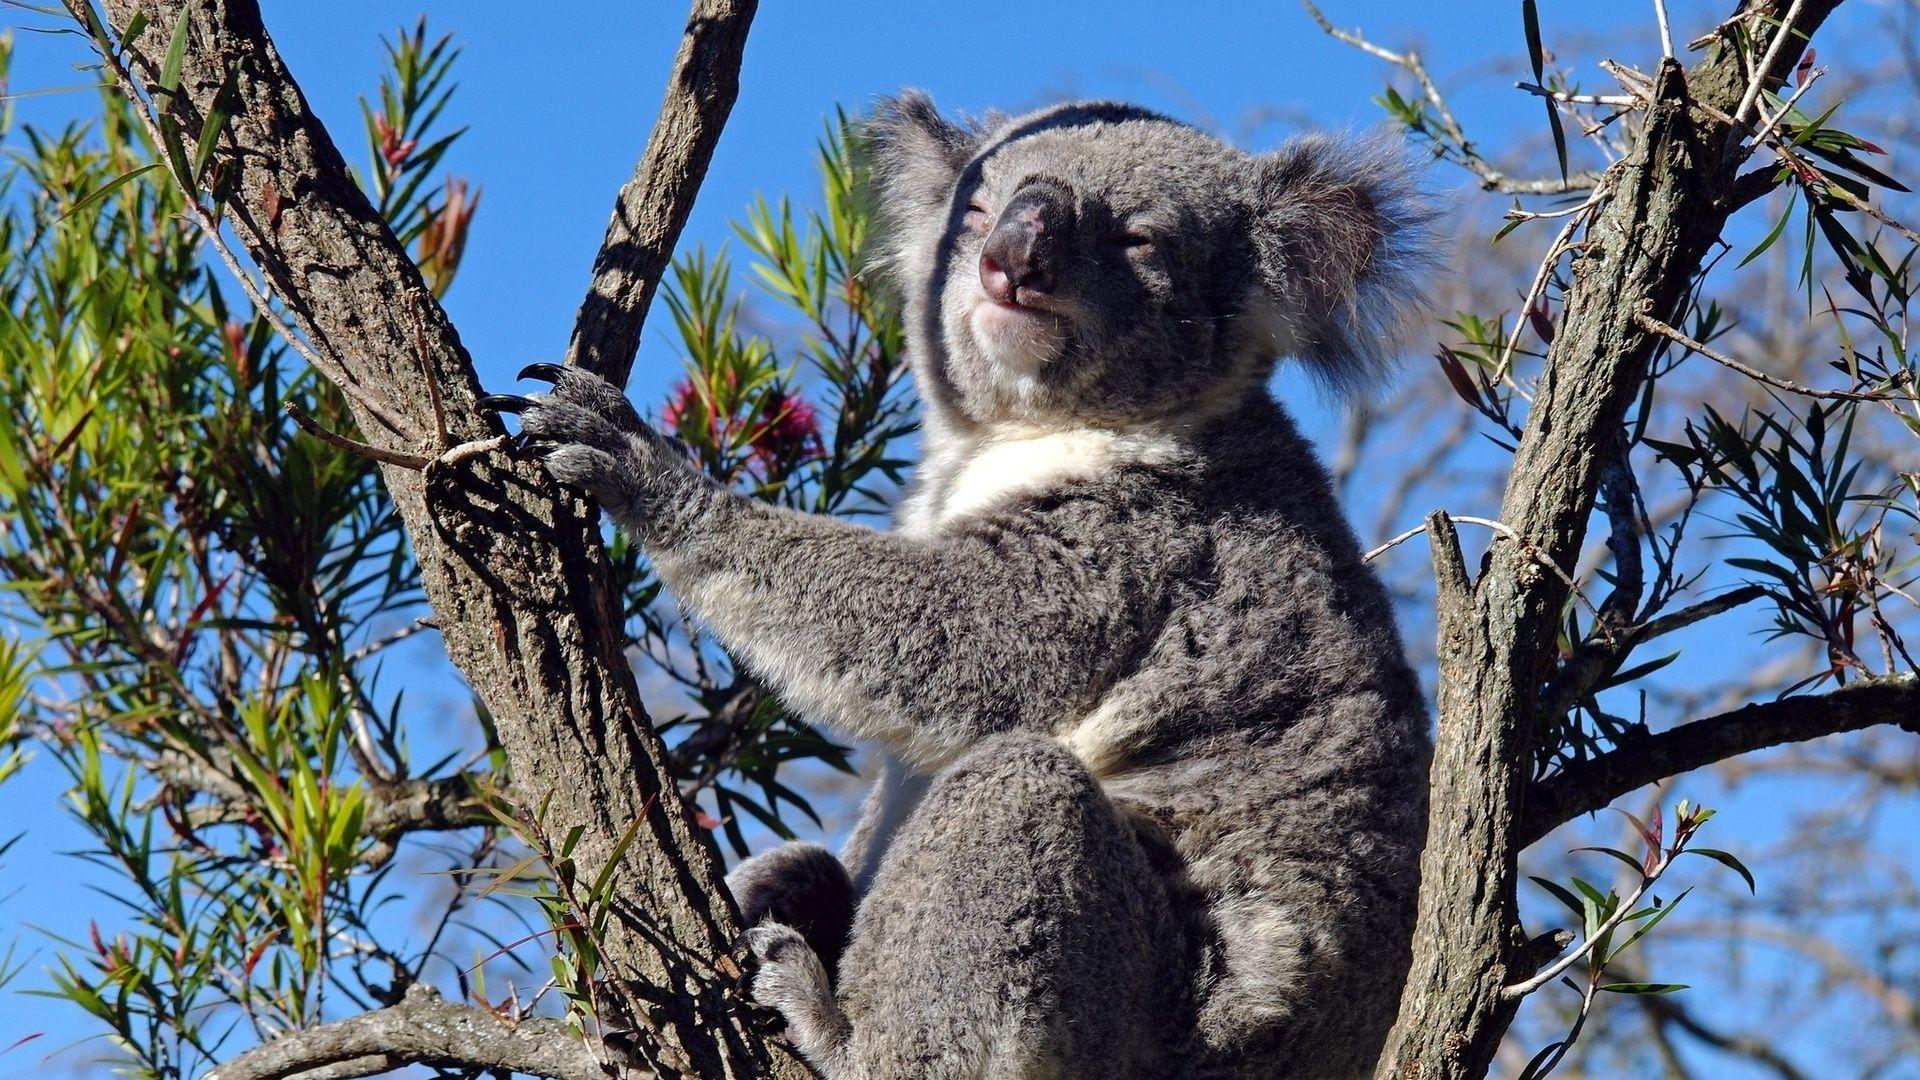 Koala On The Tree